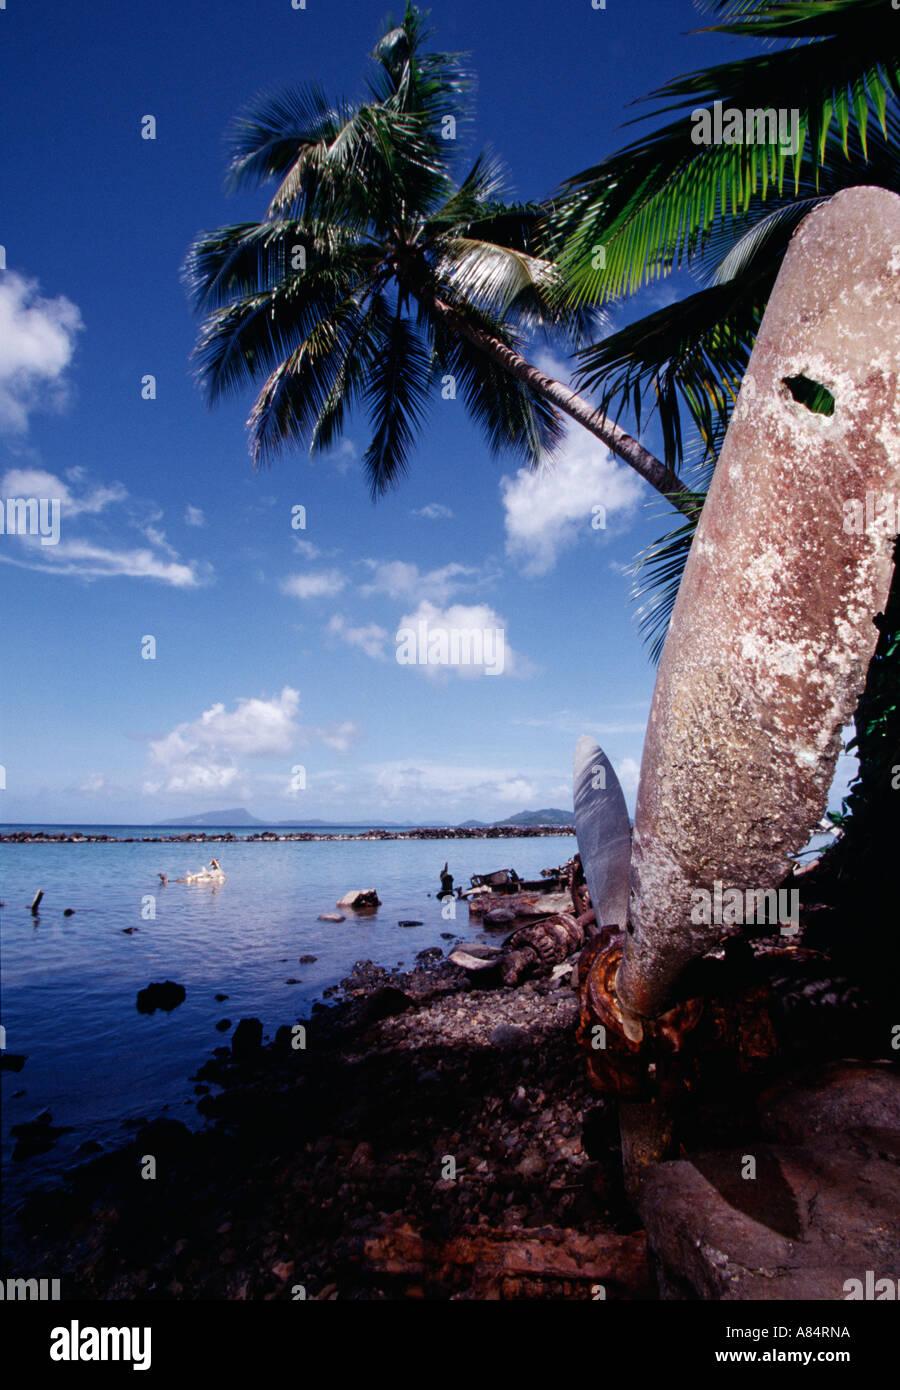 Federated states of micronesia truk lagoon param japanese aircraft wreckage stock image